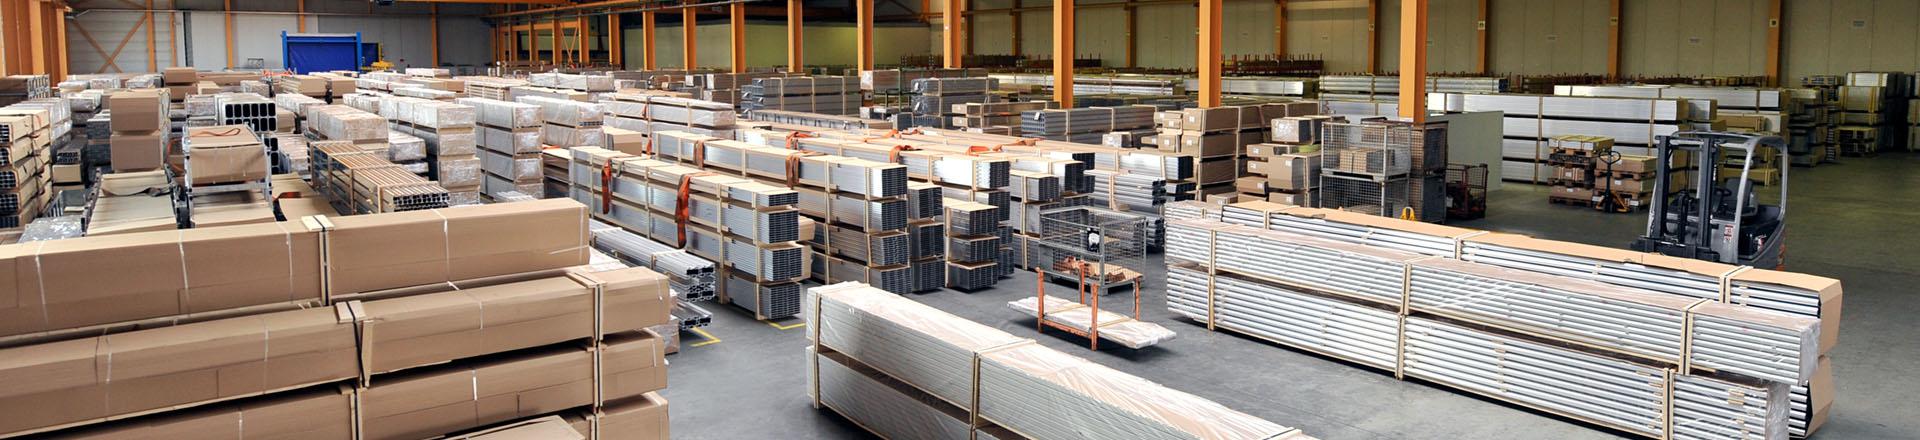 Lagerhalle Aluminiumteile